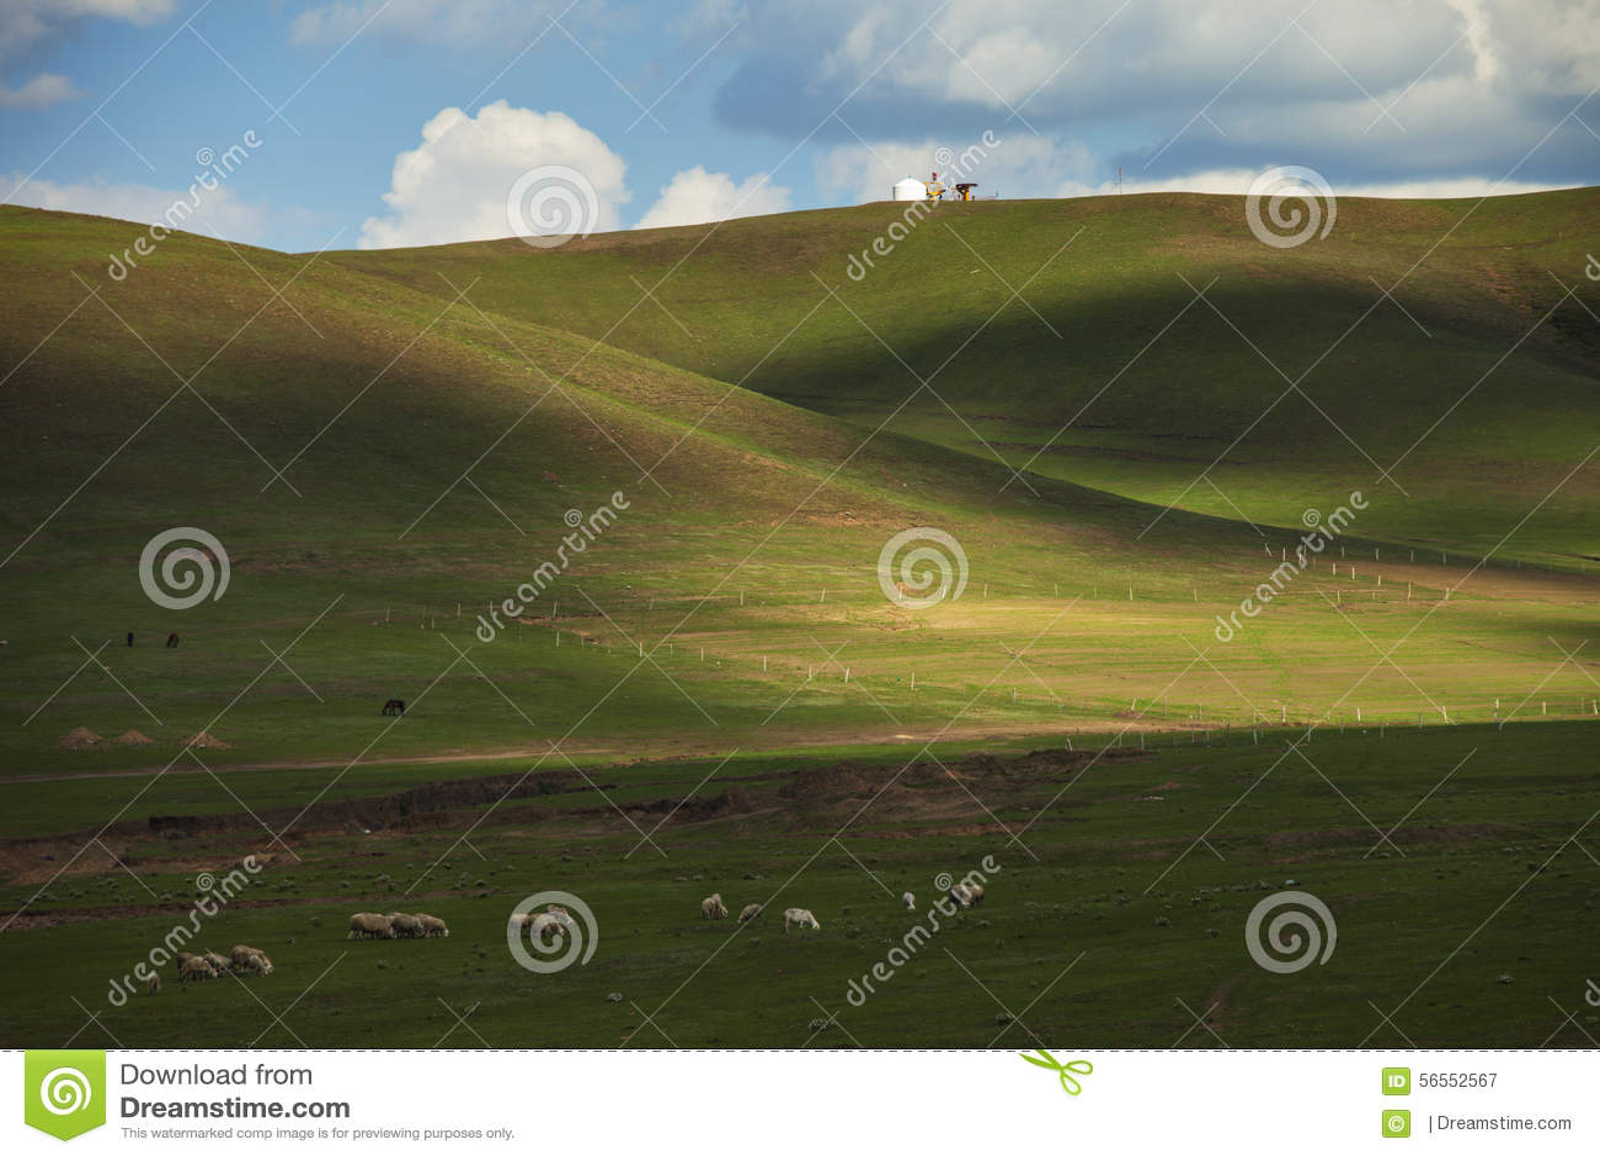 Download λιβάδια στοκ εικόνα. εικόνα από yurt, μονοπάτι, ουρανός - 56552567